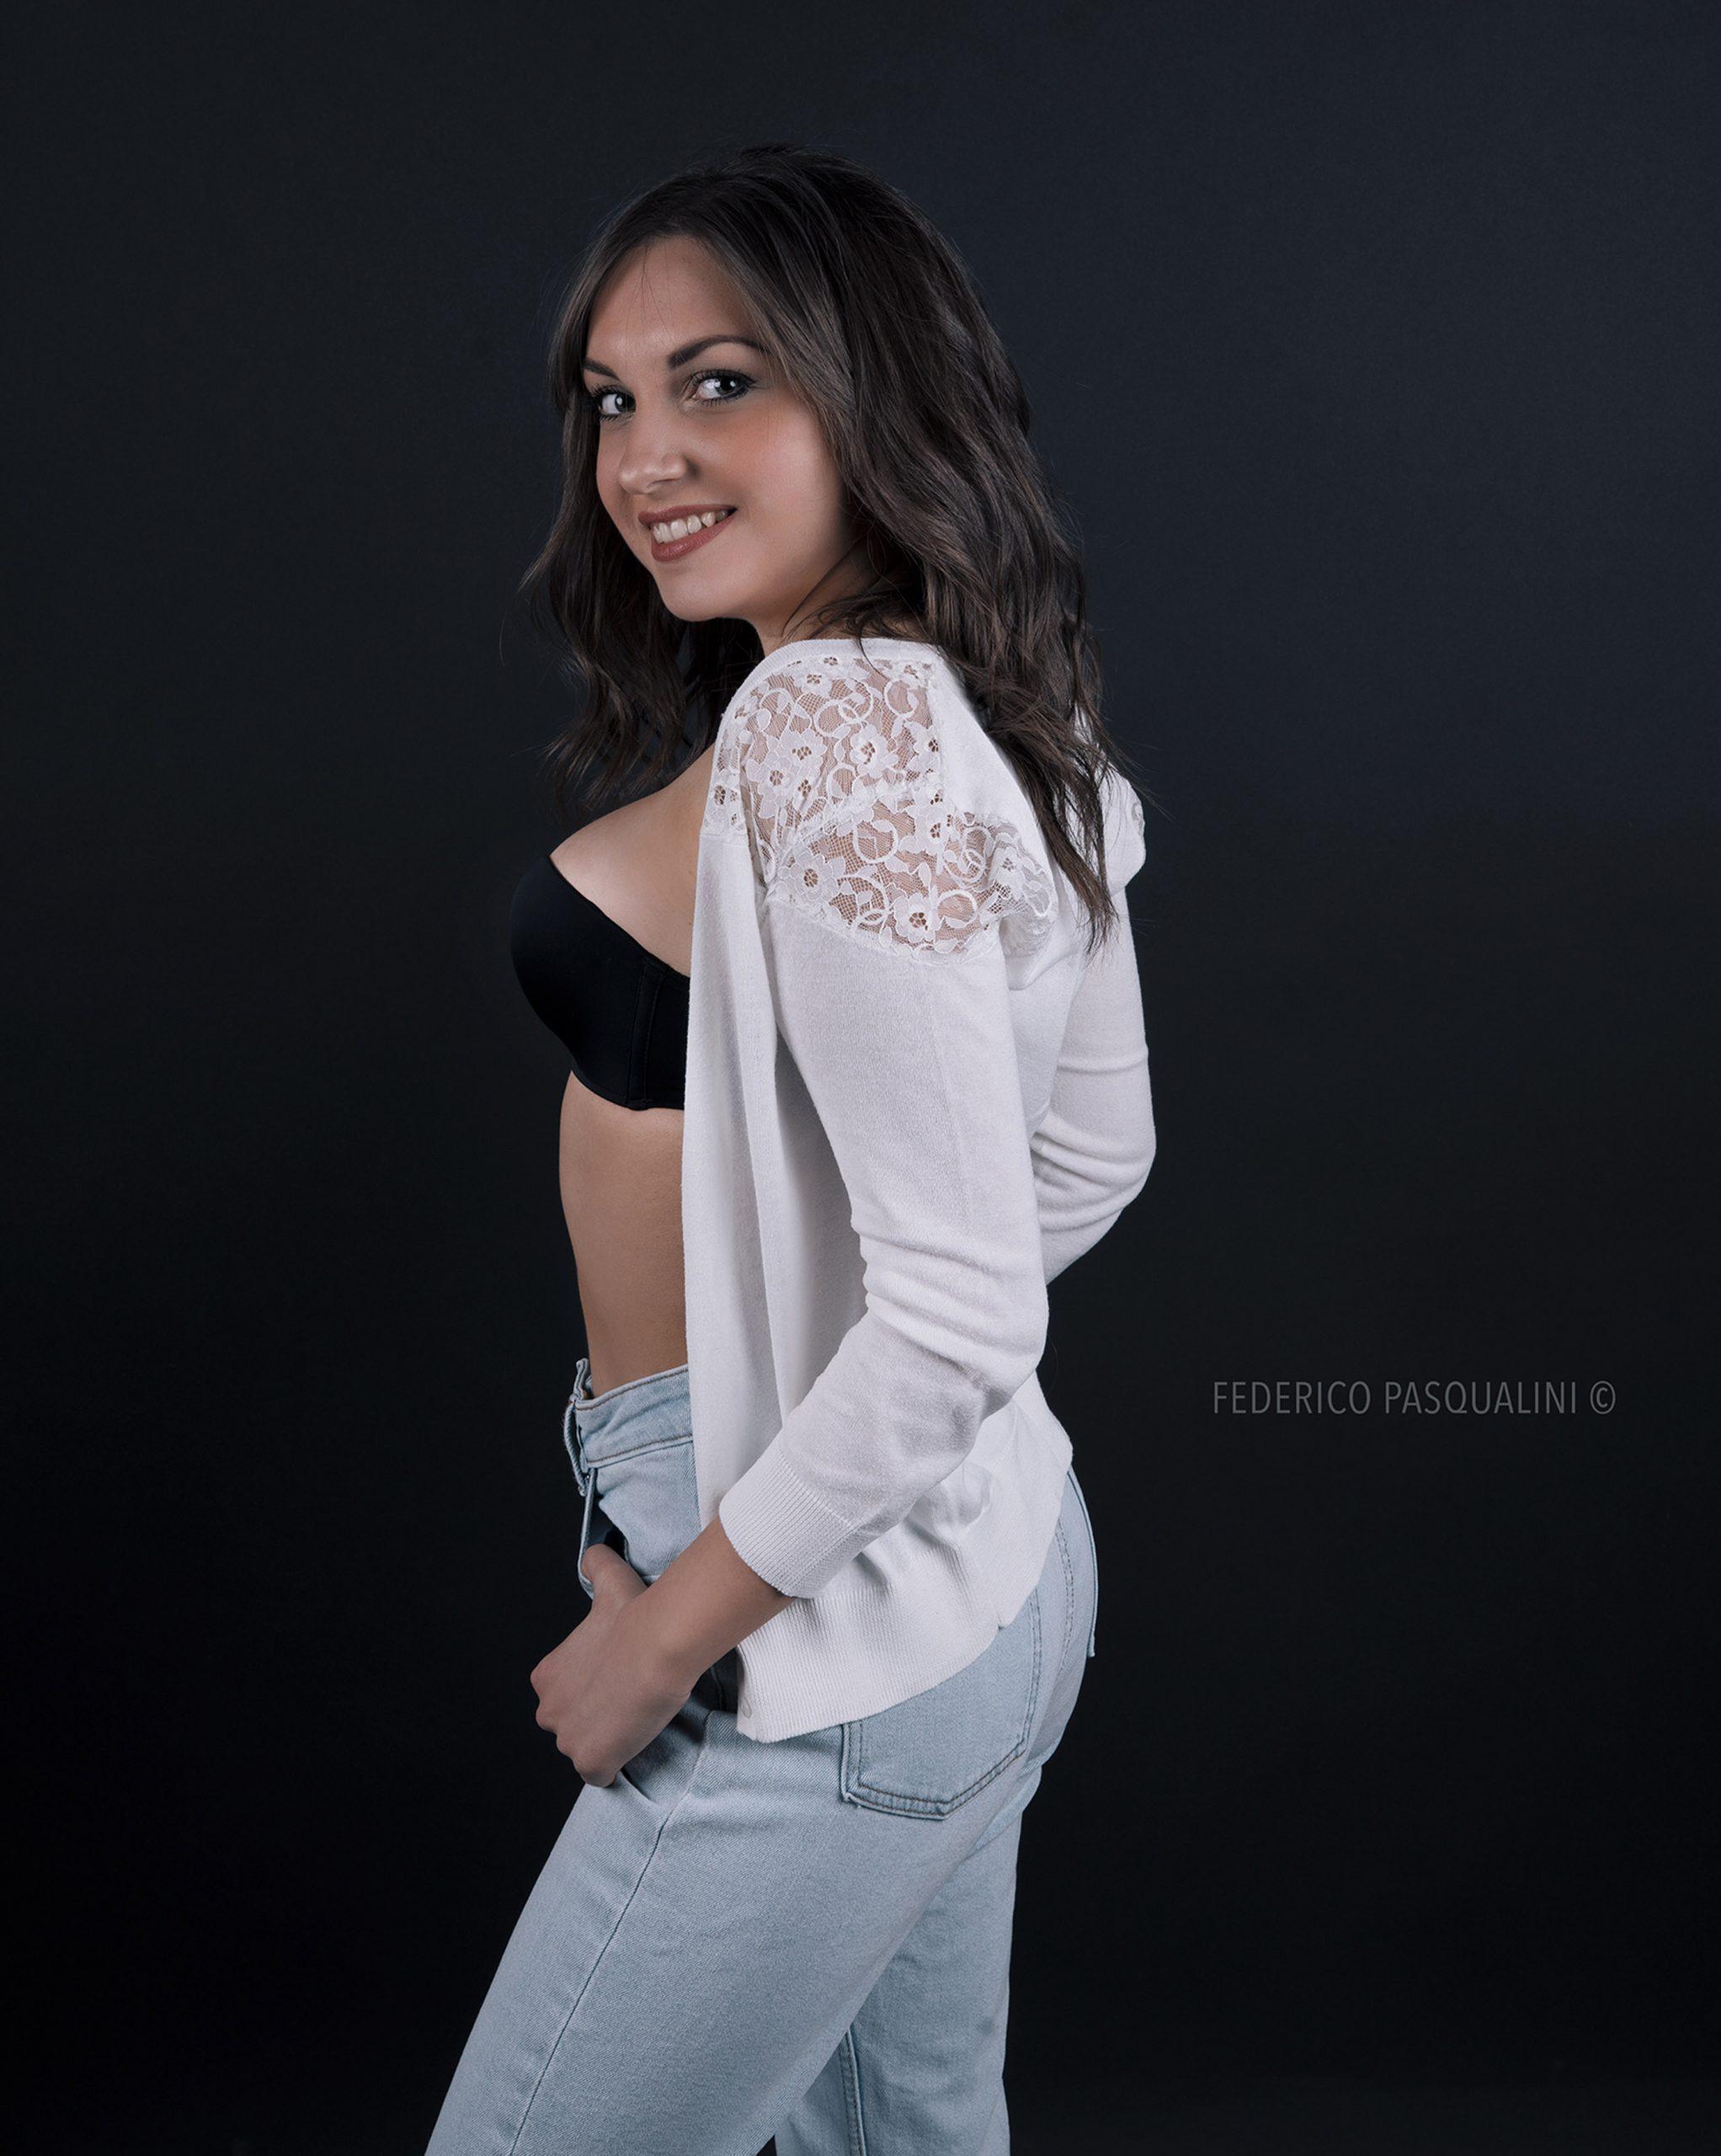 Categorie: Glamour, Portrait - Photographer: FEDERICO PASQUALINI - Model: VALENTINA MURARI - Location: Verona, VR, Italia